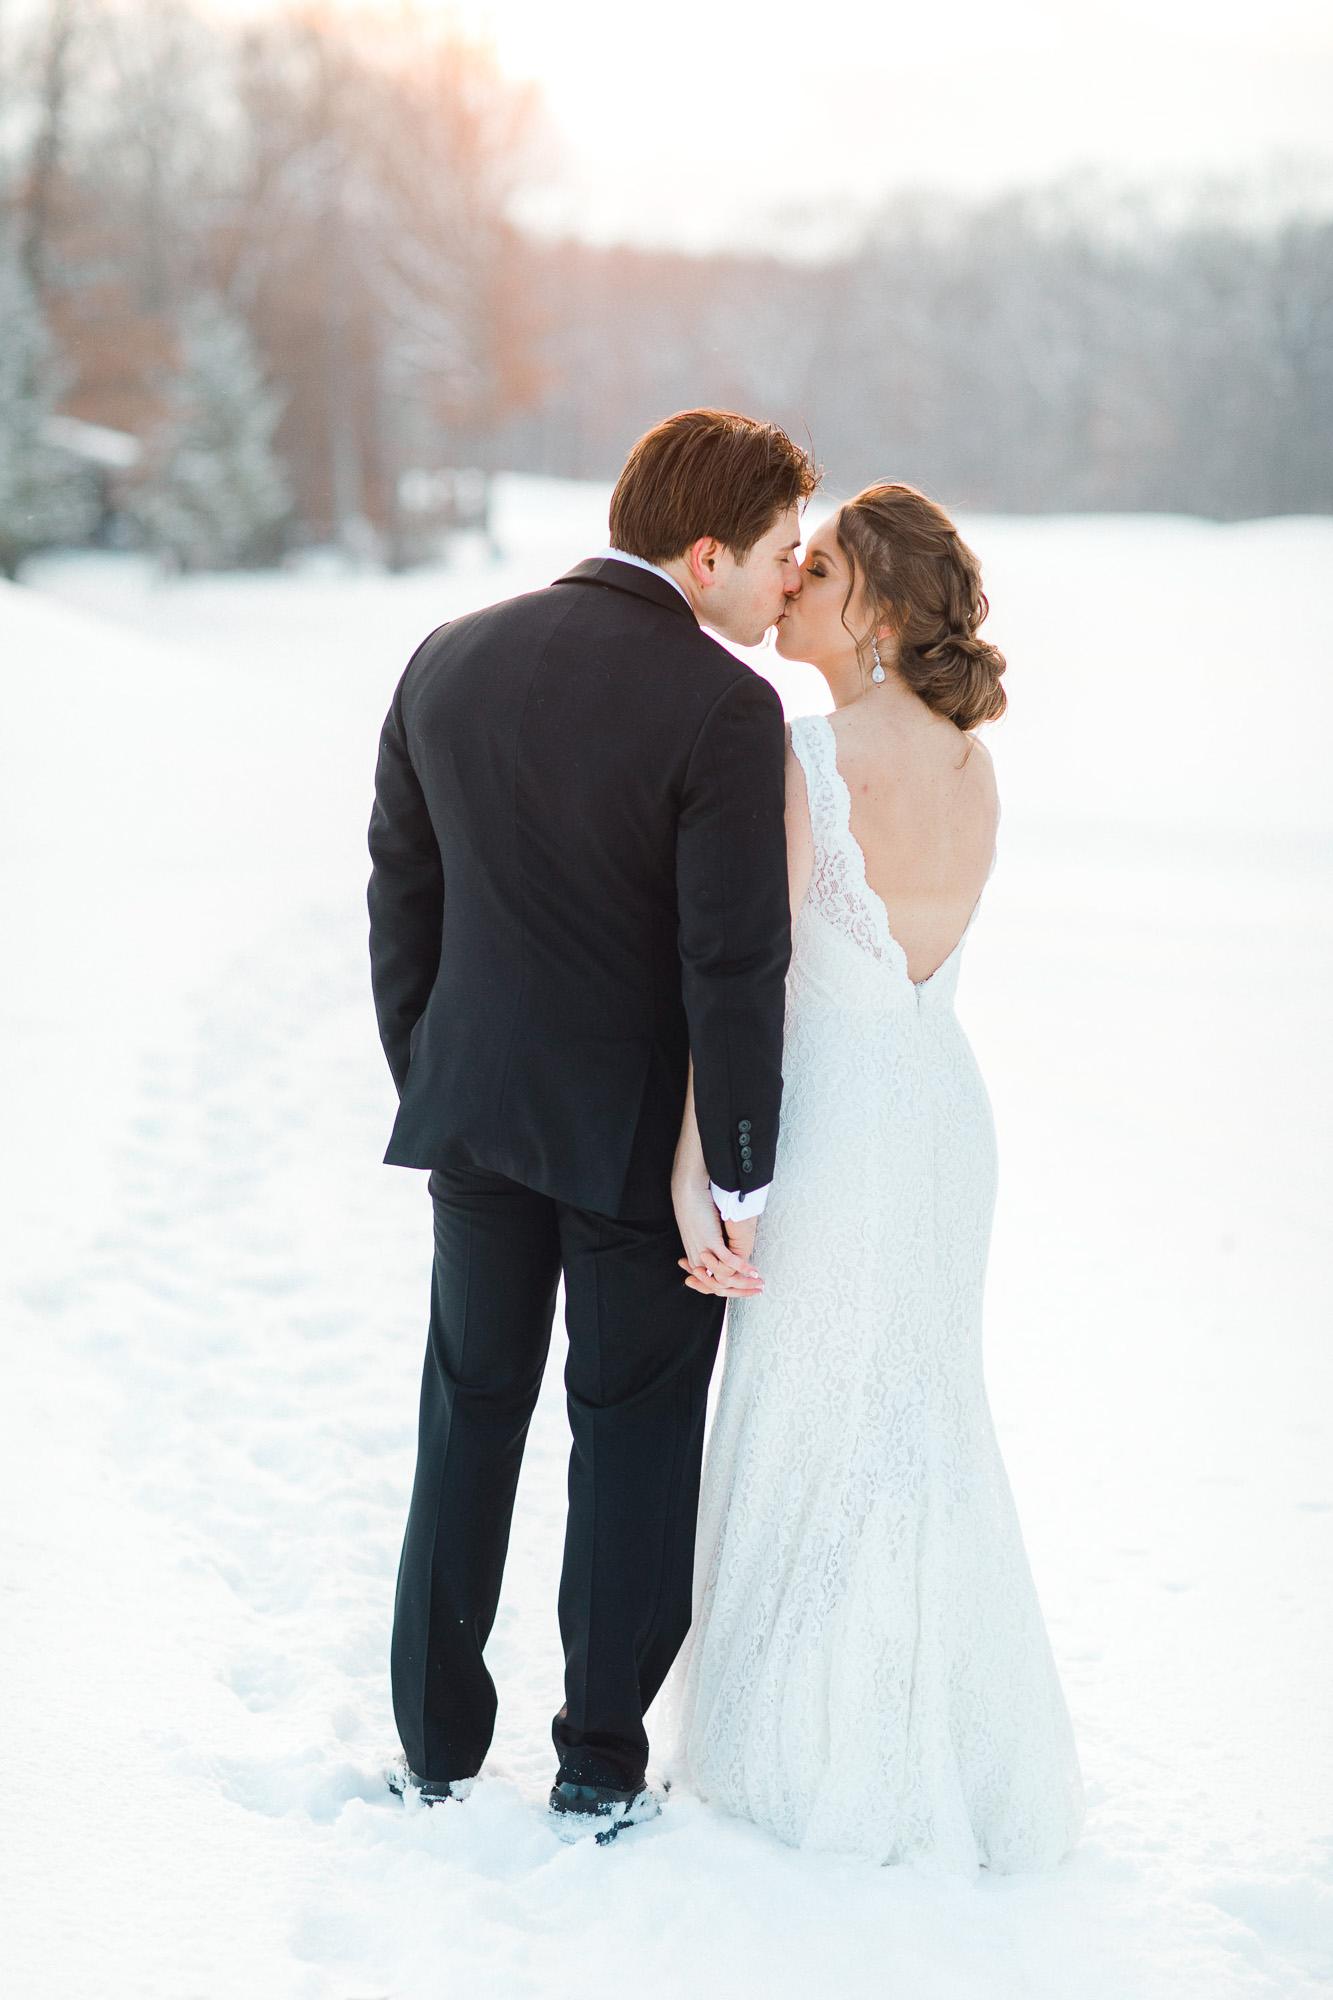 snowy-sand-springs-country-club-drums-pa-christmas-wedding-24916.jpg